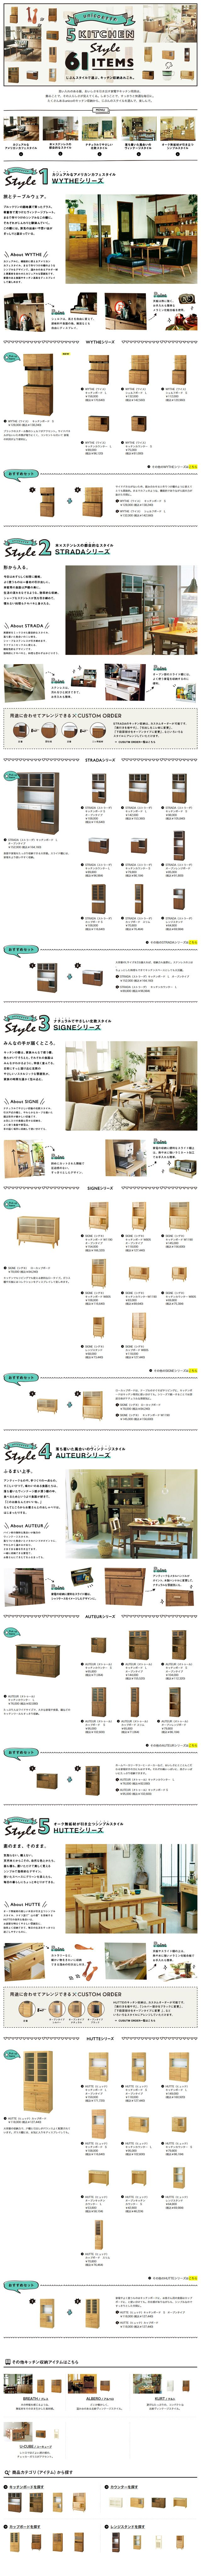 unicoおすすめ 5KITCHEN style 61ITEMS